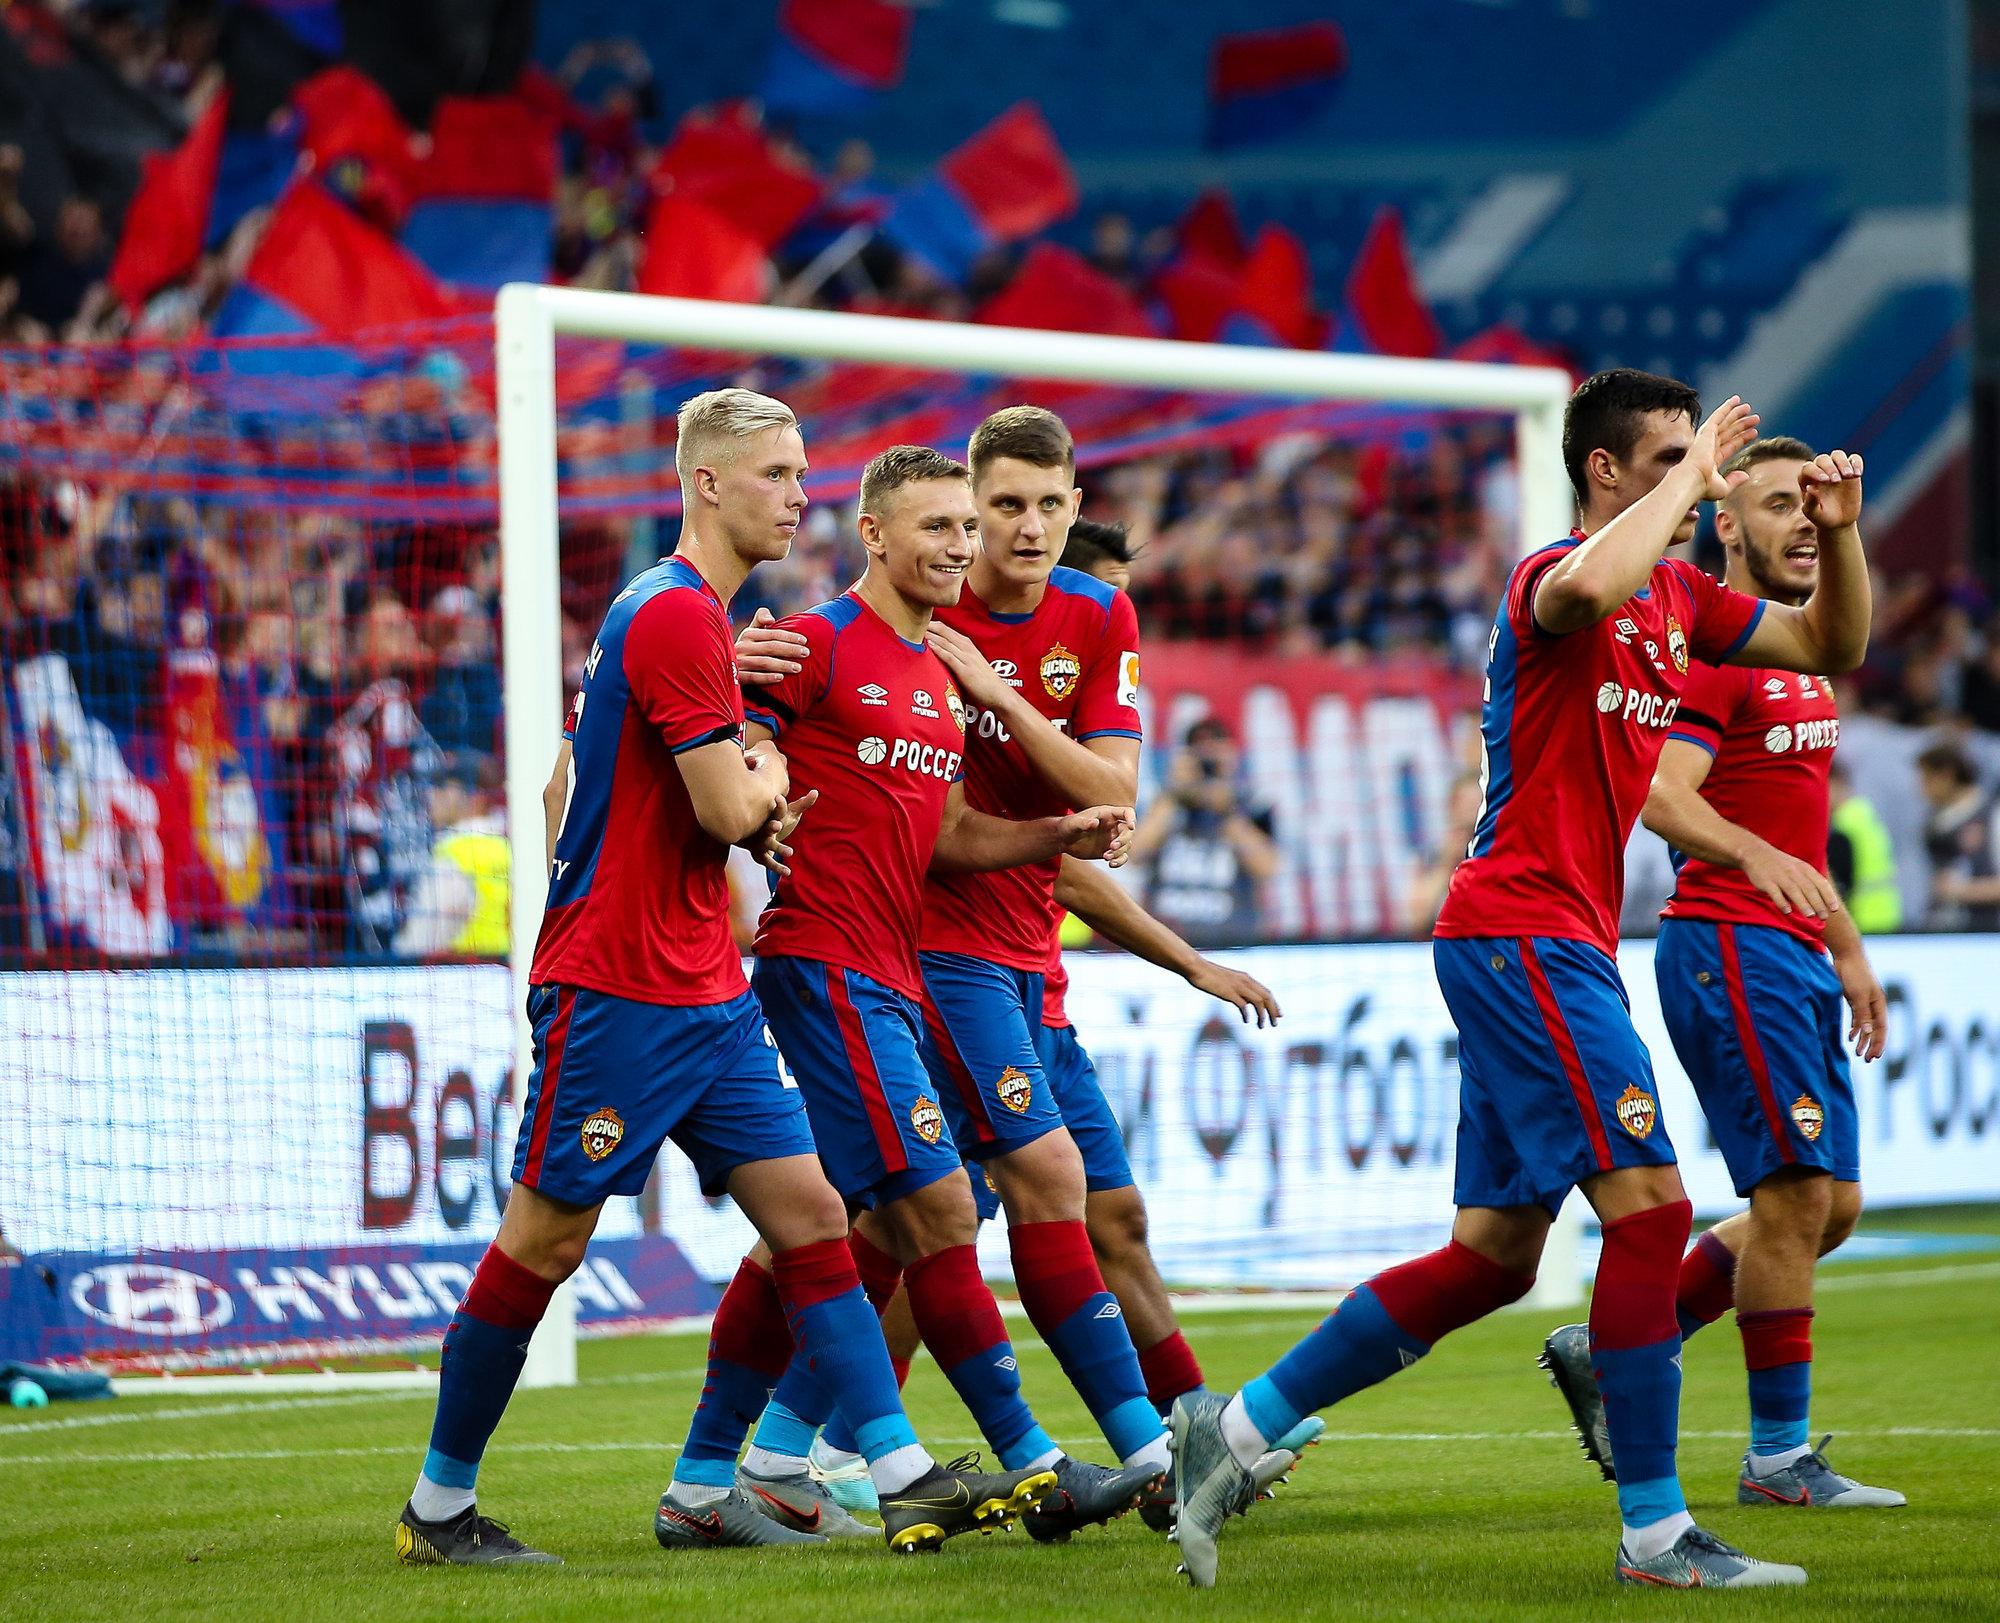 ЦСКА 2019/20